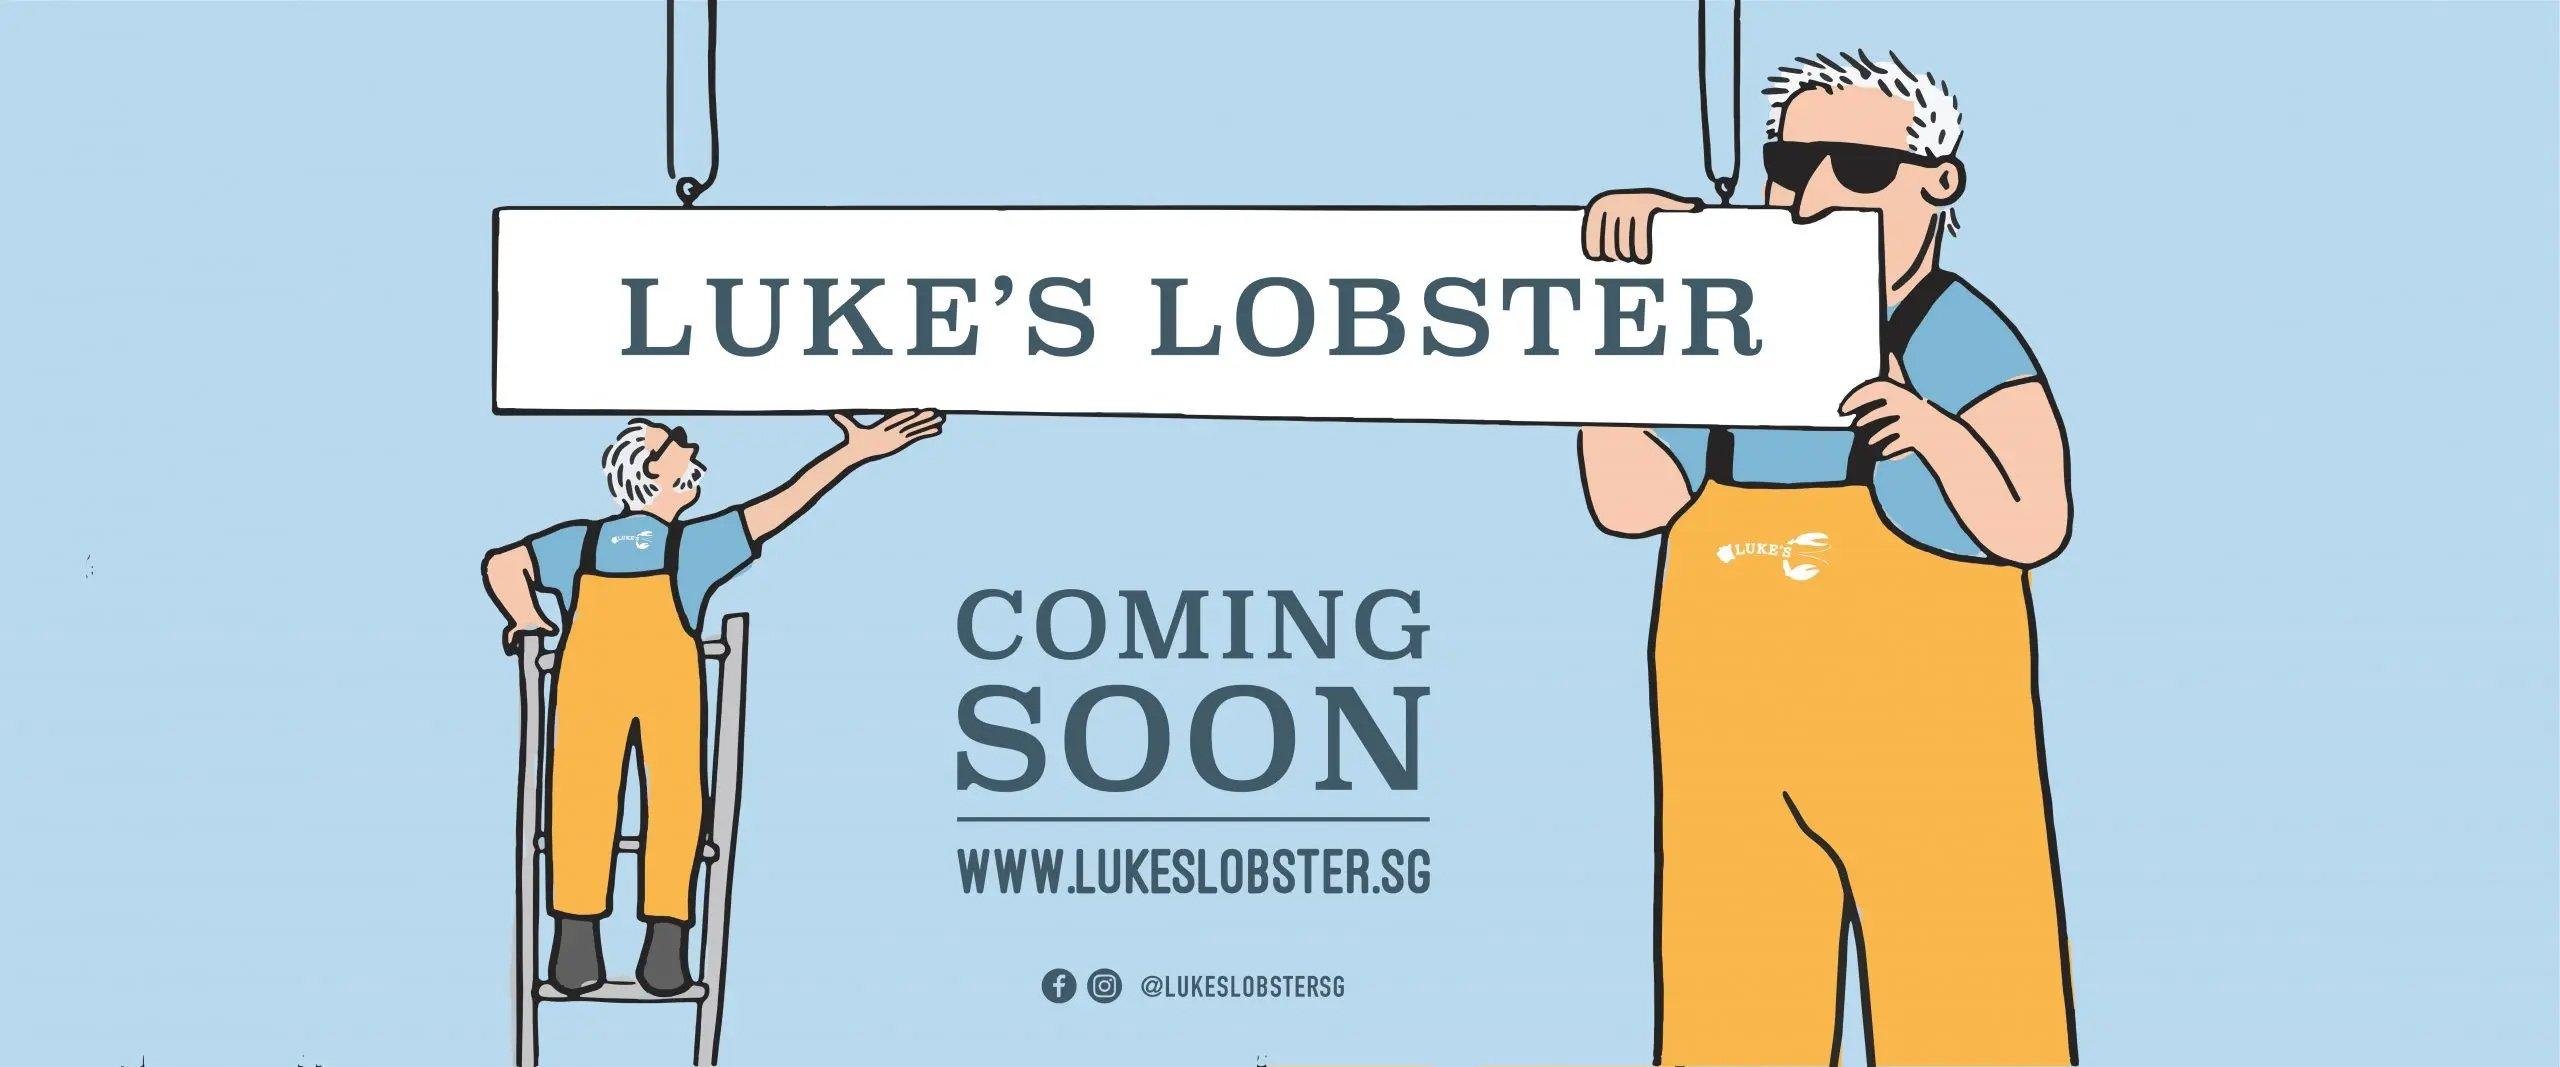 Luke's Lobster Singapore Coming Soon